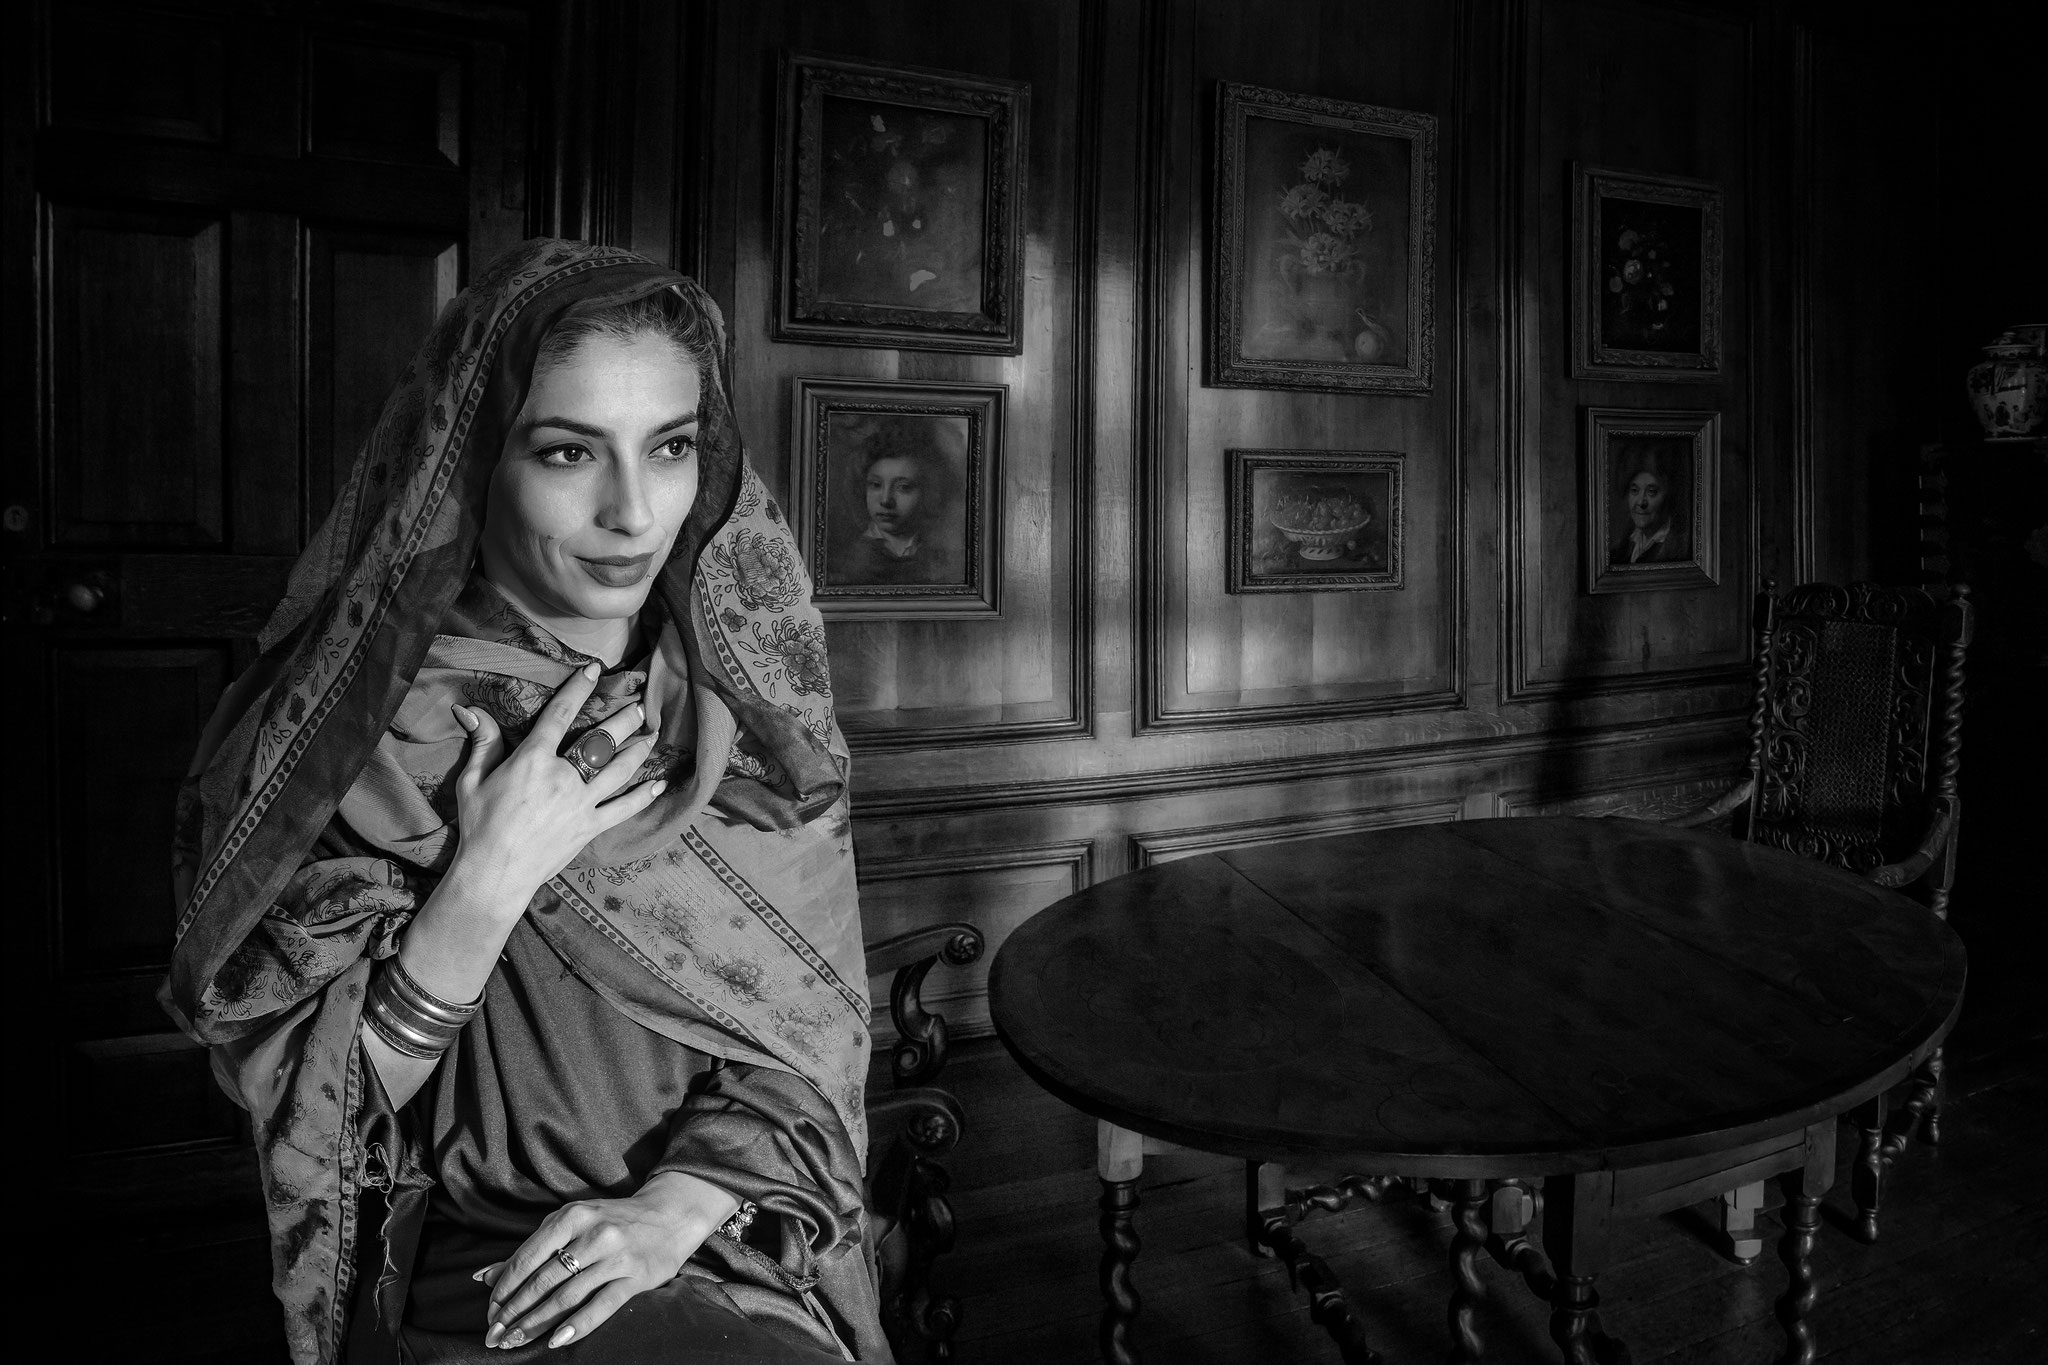 Ruxandra Calin EFIAPb (Romania) - Black and white dreams